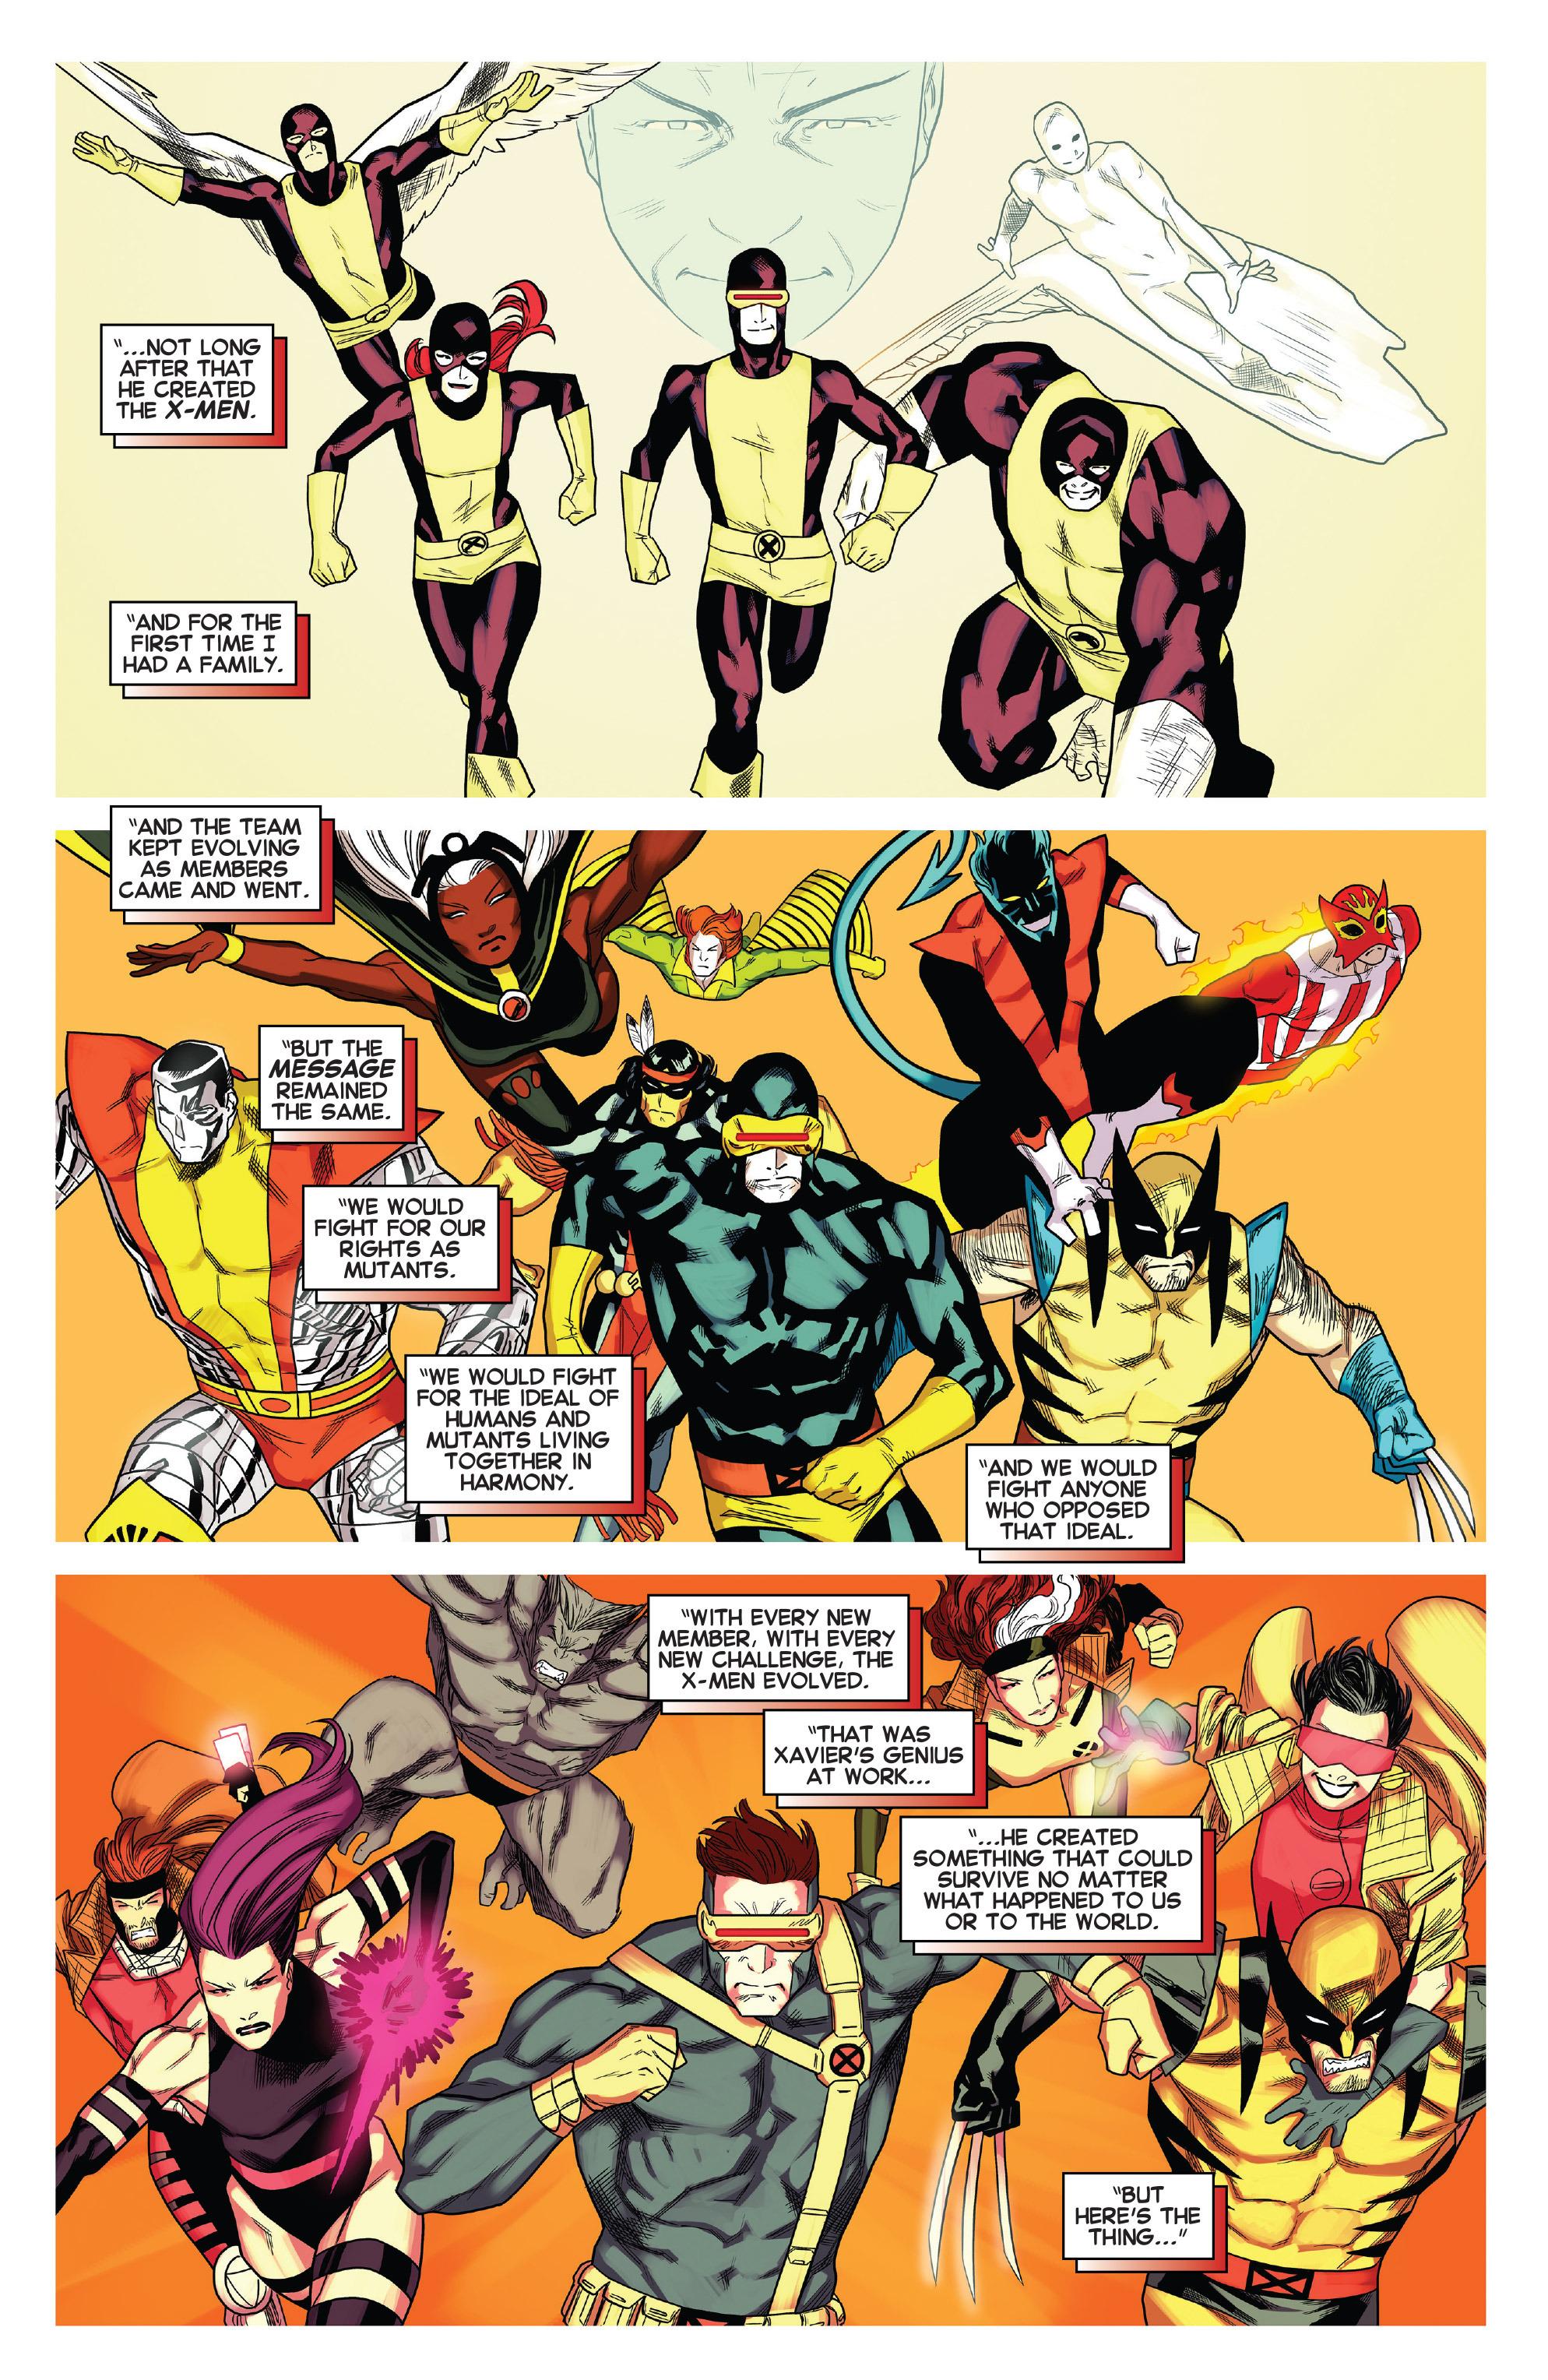 Read online Uncanny X-Men (2013) comic -  Issue # _TPB 5 - The Omega Mutant - 46